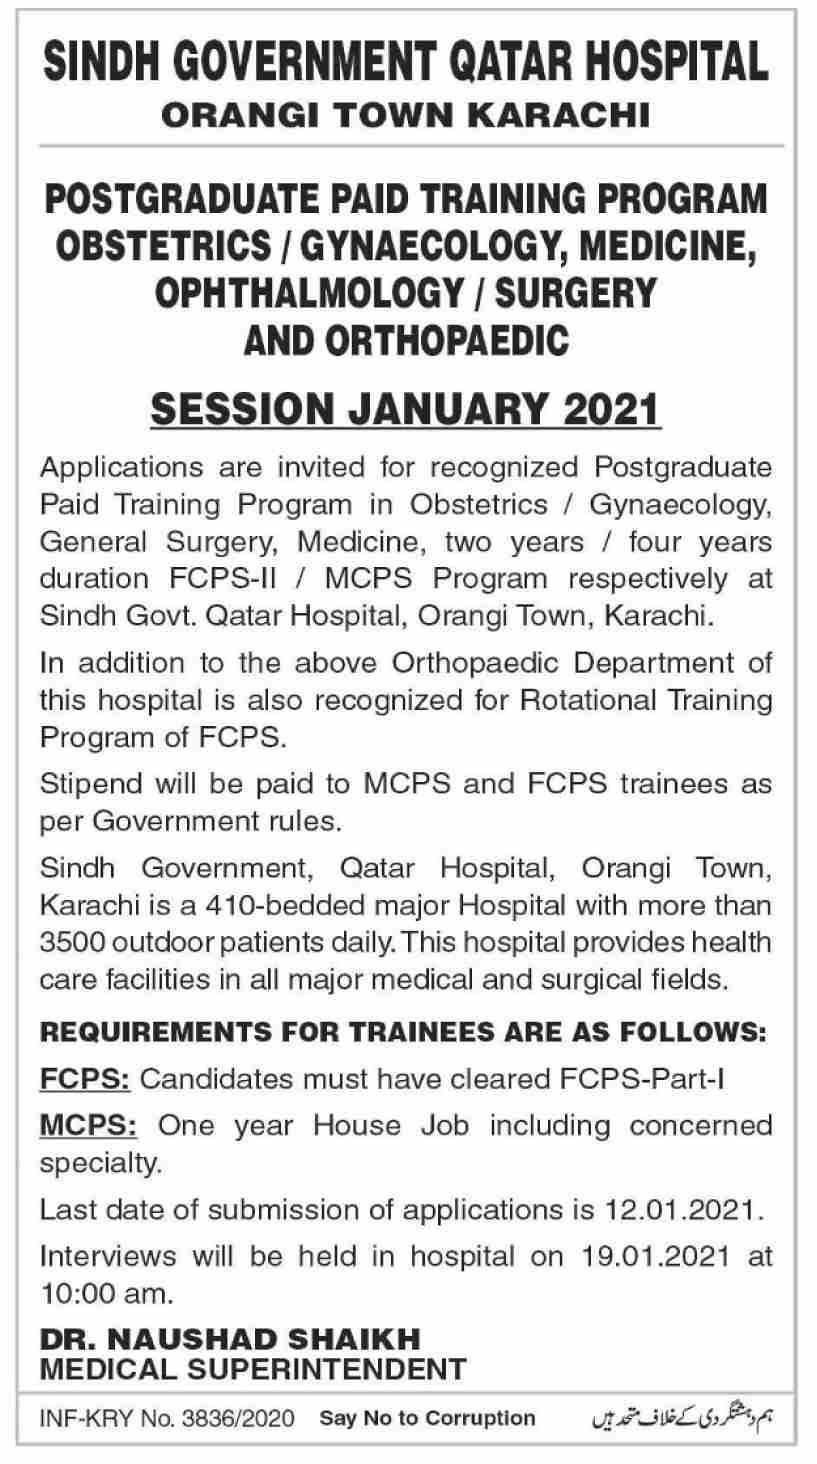 Qatar Hospital Jobs 2021 - Sindh Government Jobs 2021 - Jobs in Karachi 2021 - Post Graduate Trainee Jobs 2021